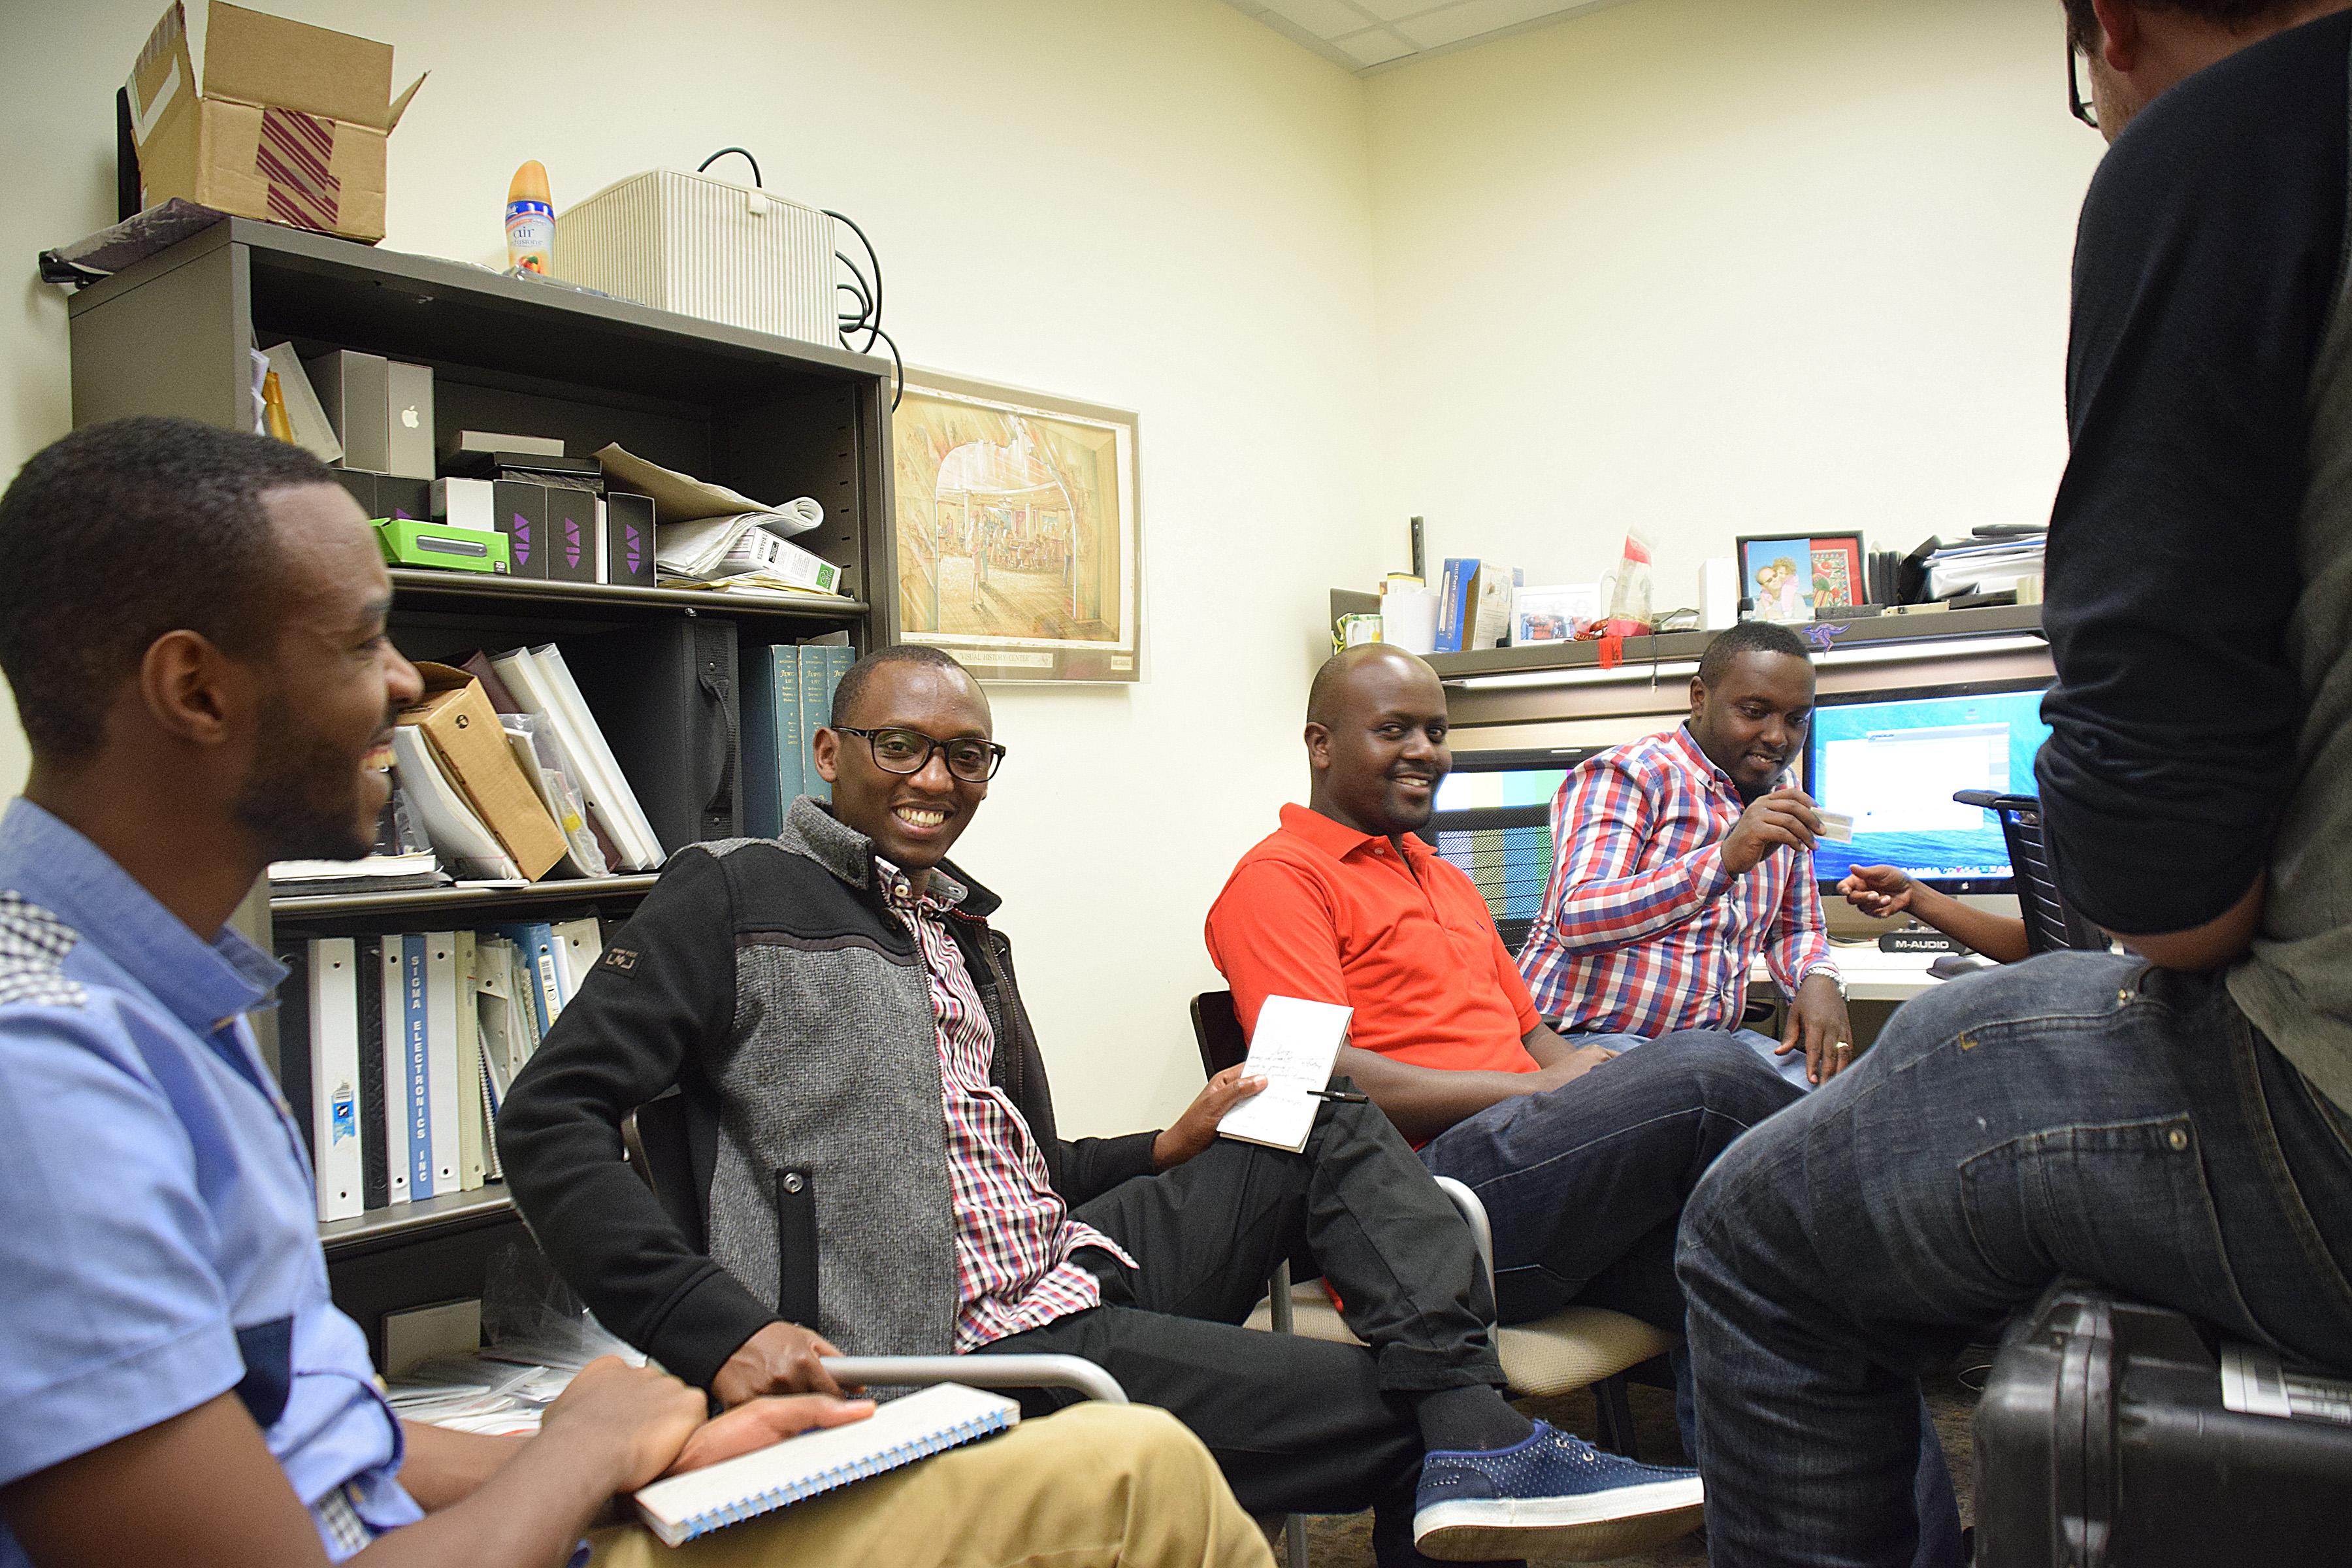 L-R: Digital Officer Fabrice Musafiri, Camera Operator Patrick Nkubana, IT Specialist Clement Muhire, Claver Irakoze, talk with Consolee